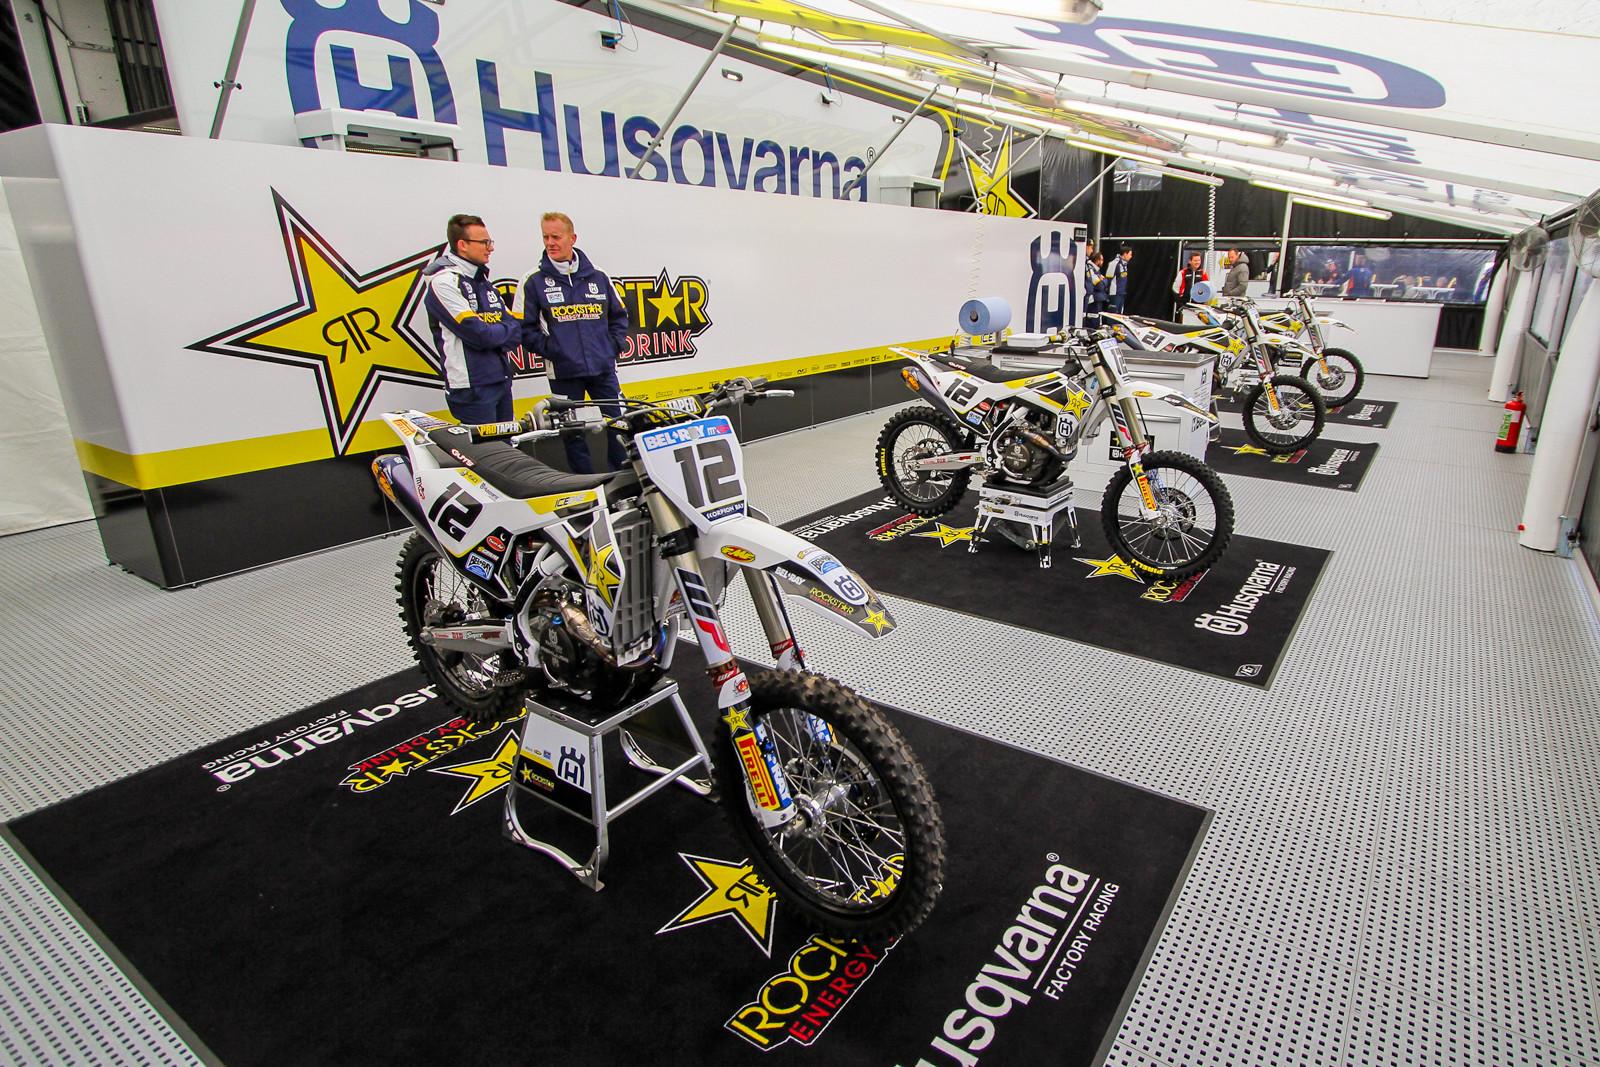 Rockstar Energy Husqvarna Racing - Vital MX Pit Bits: 2017 MXGP of Valkenswaard - Motocross Pictures - Vital MX